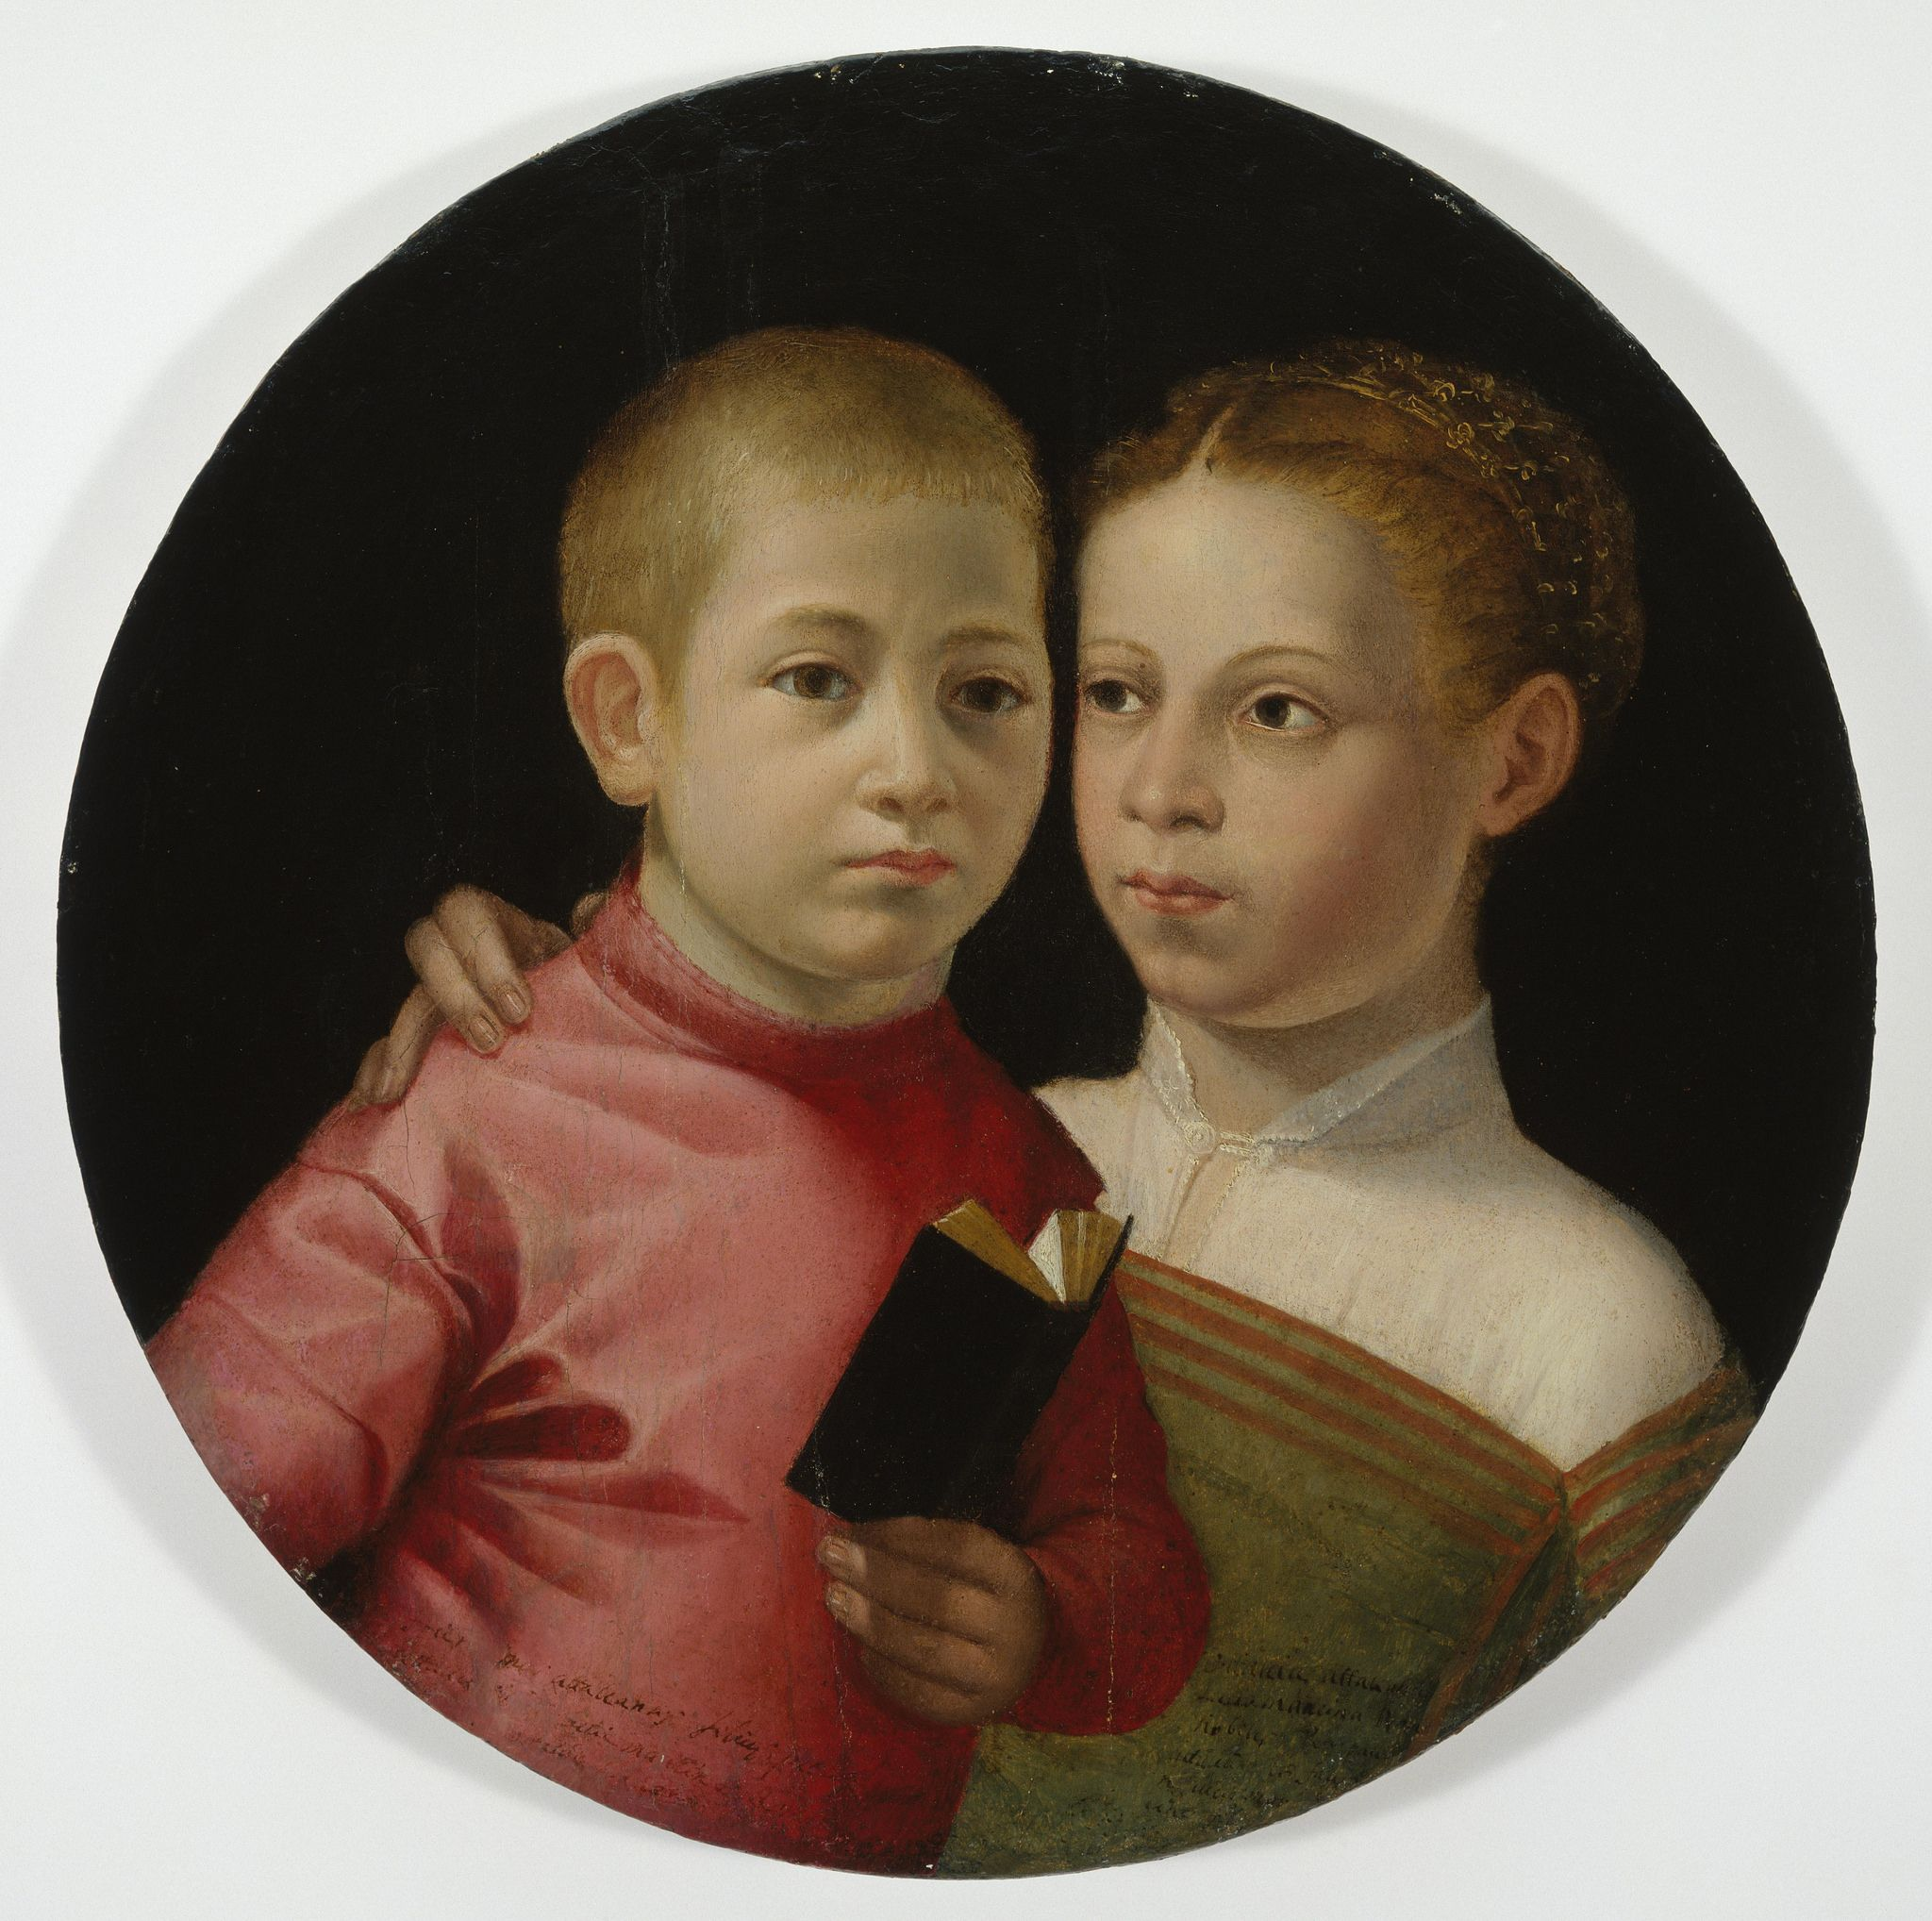 https://flic.kr/p/riz2MP | Sofonisba Anguissola, Italian, 1528-1625 | European paintings by old masters XIV-XVIII century